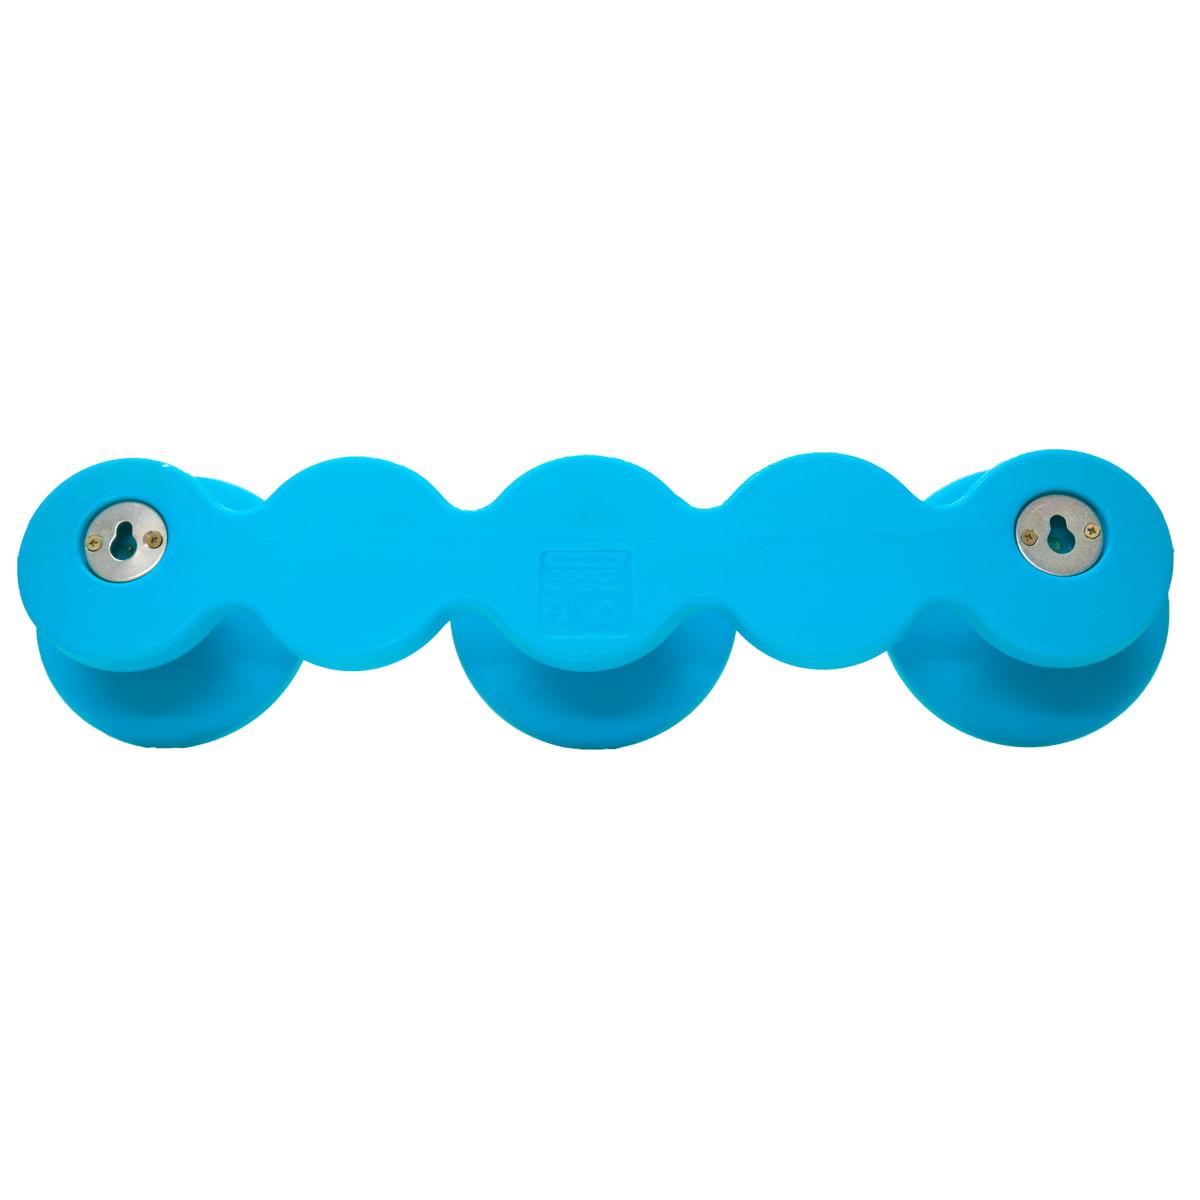 Cabide Infantil Tramontina Bola em Polietileno Azul